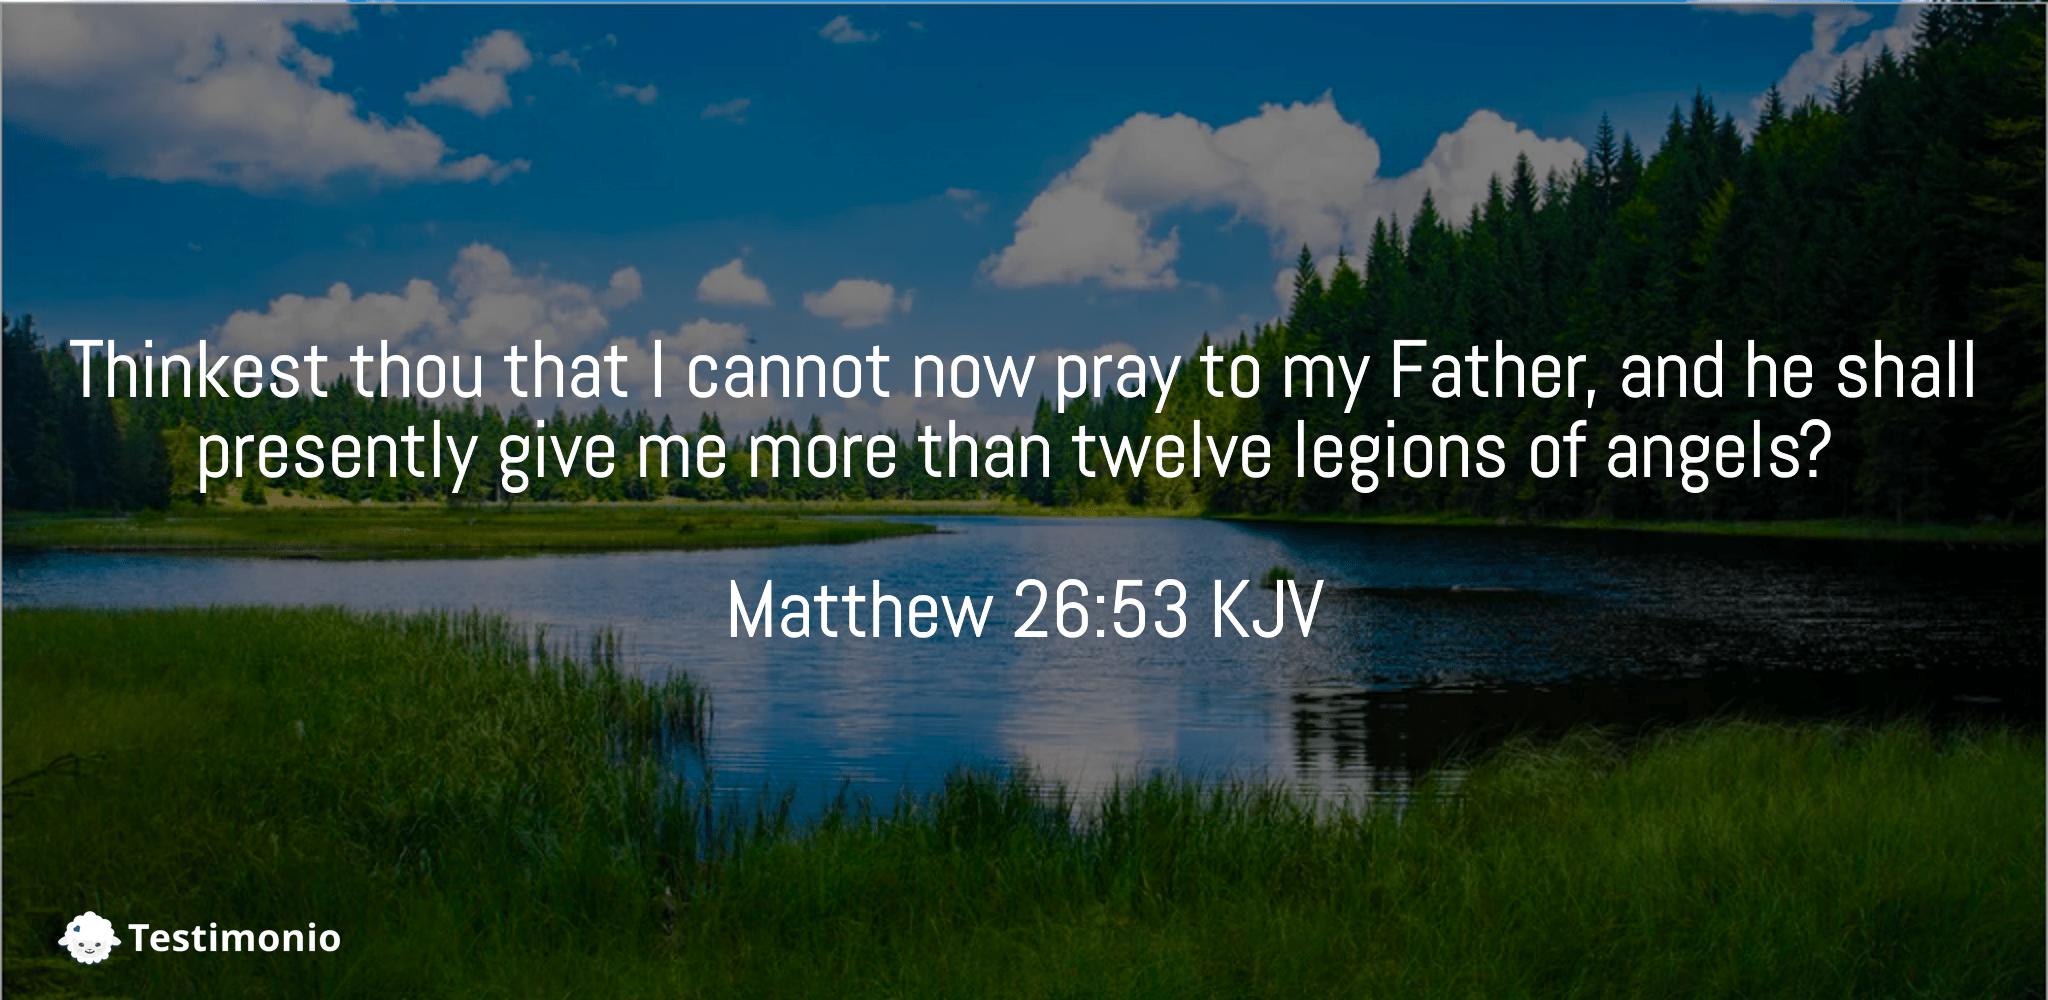 Matthew 26:53